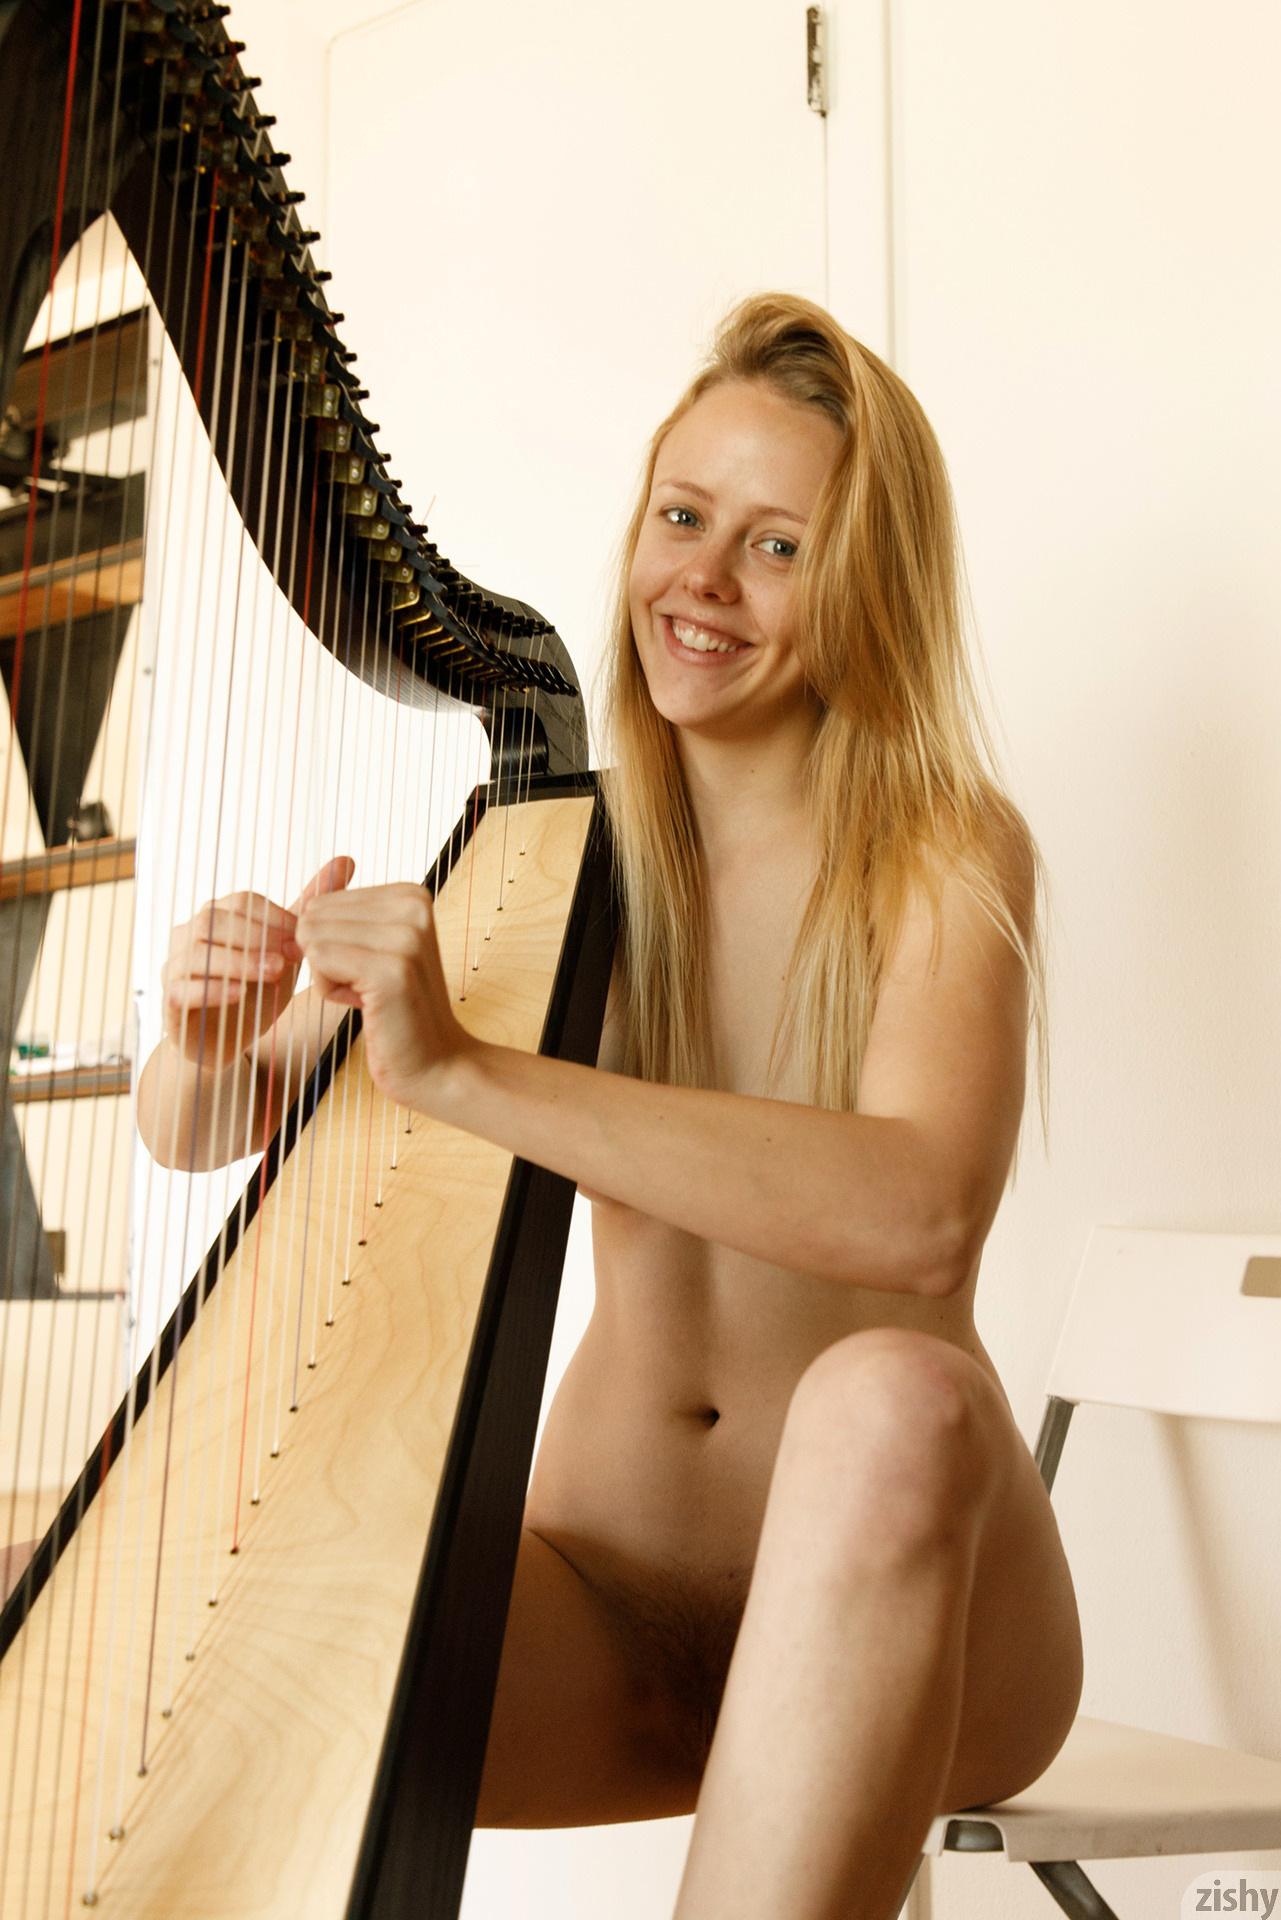 Helen Bergstrom Show Me Your Strings Zishy (17)